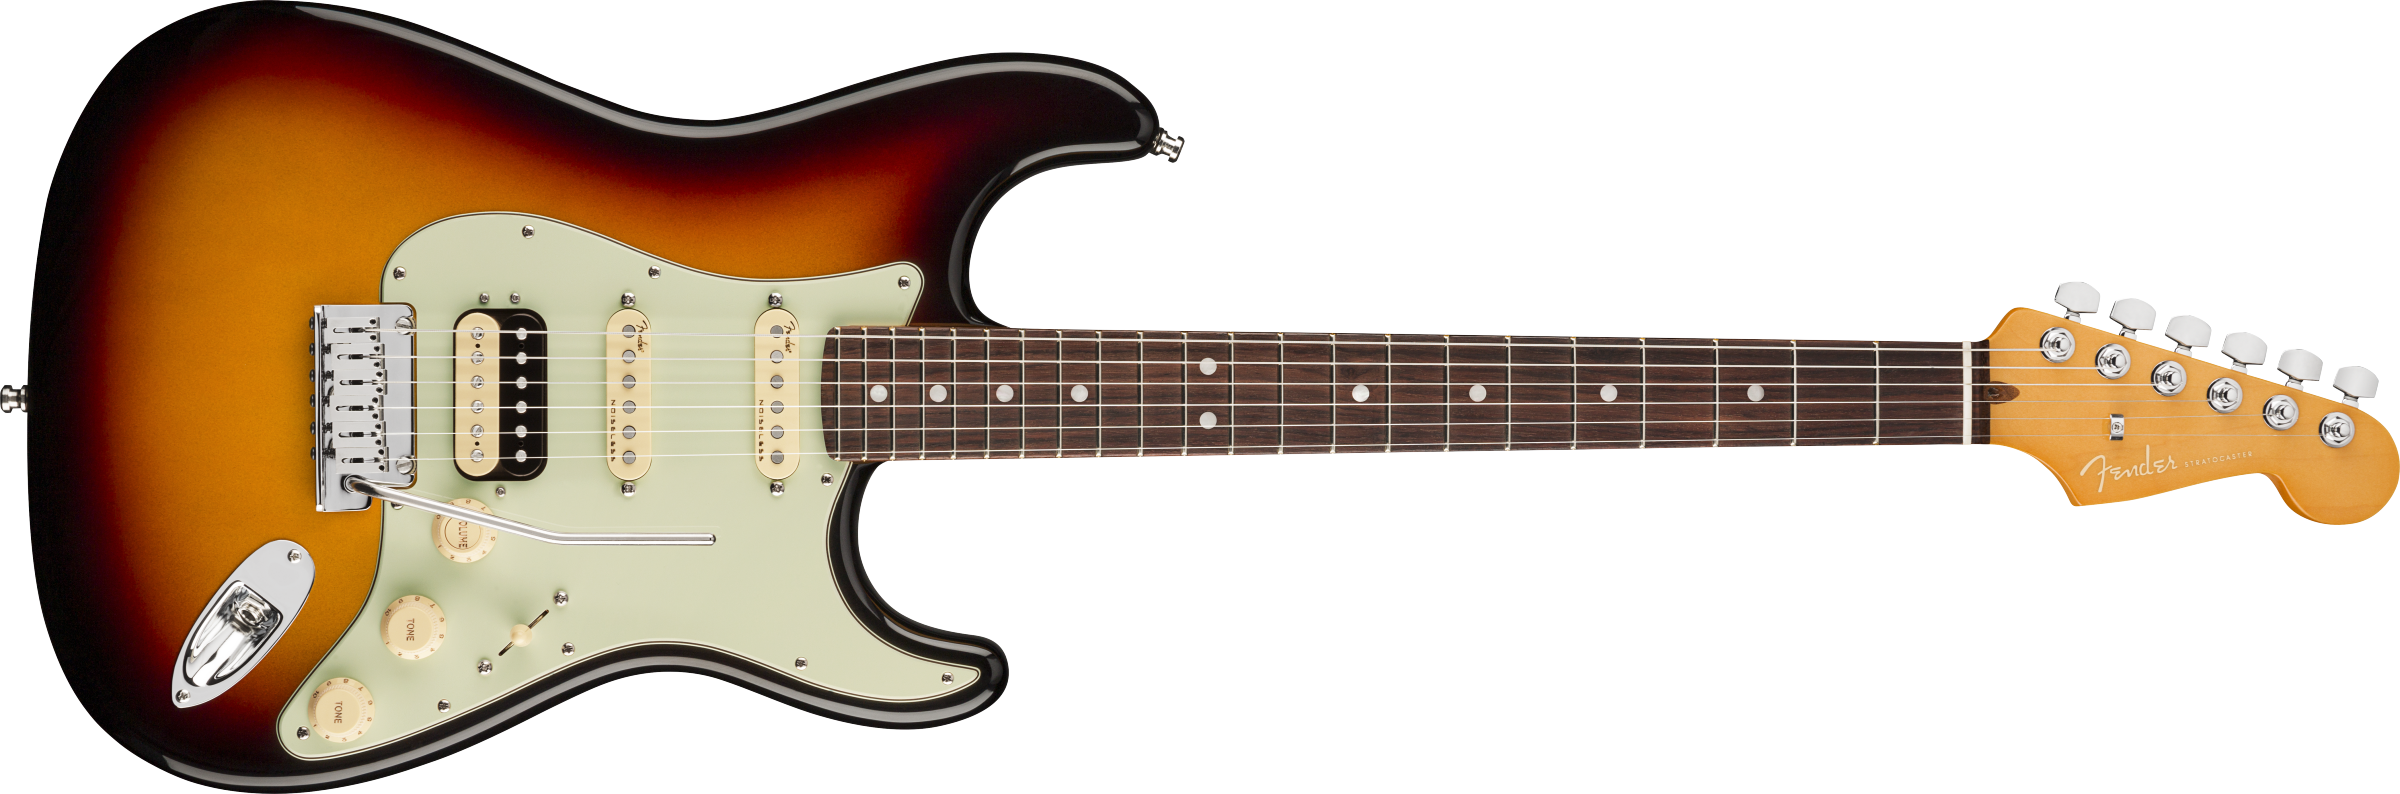 Fender American Ultra Stratocaster HSS Rosewood Fingerboard Ultraburst elektrinė gitara